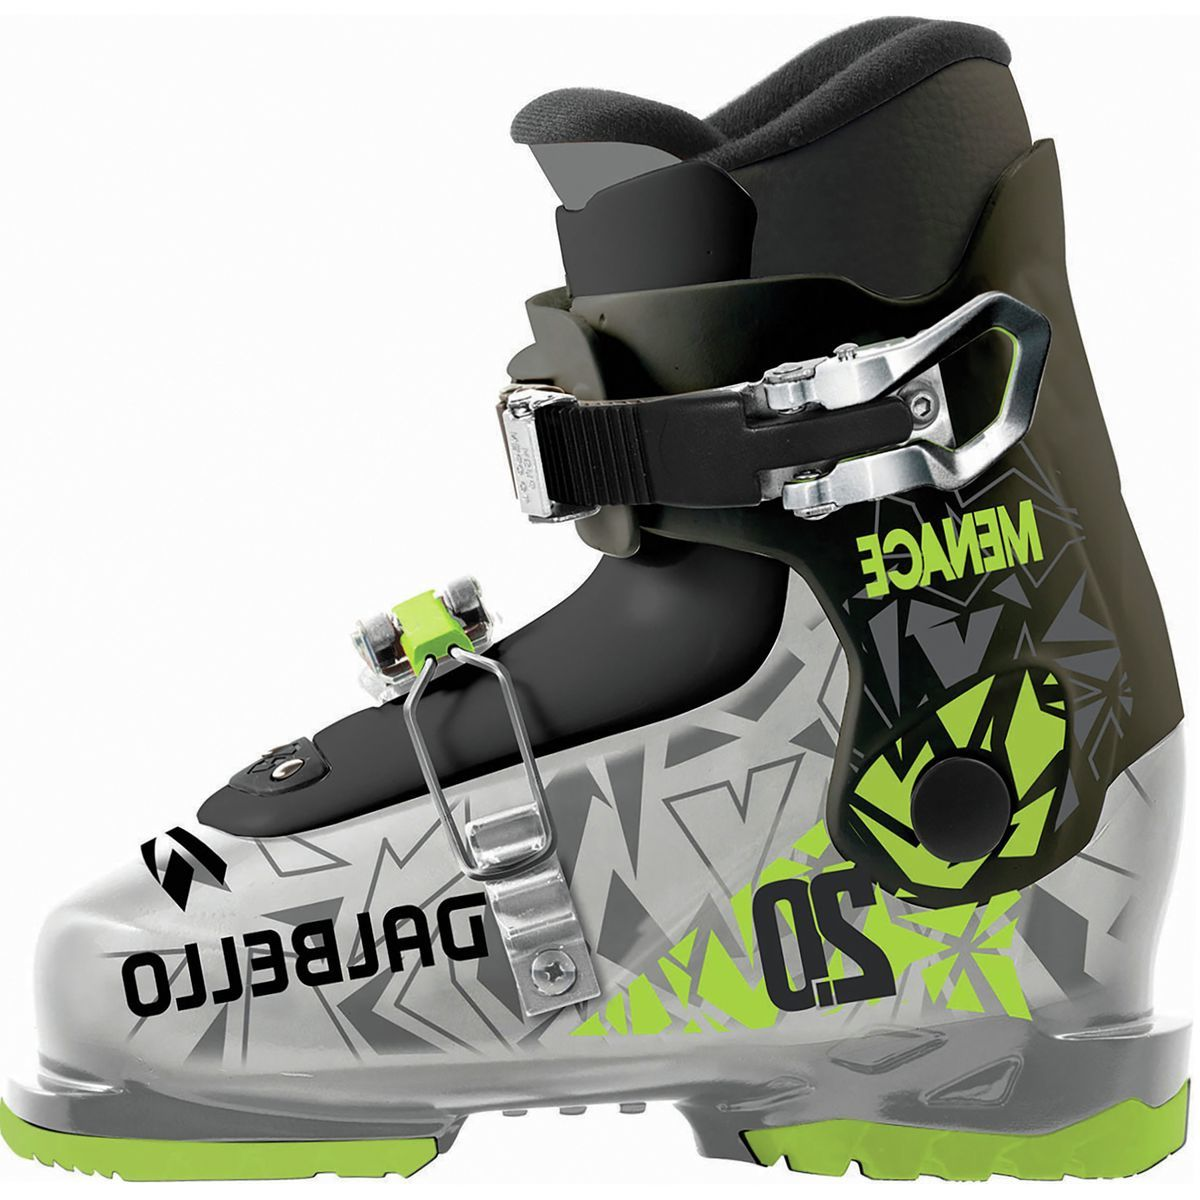 Dalbello Sports Menace 2 Ski Boot - Boys'